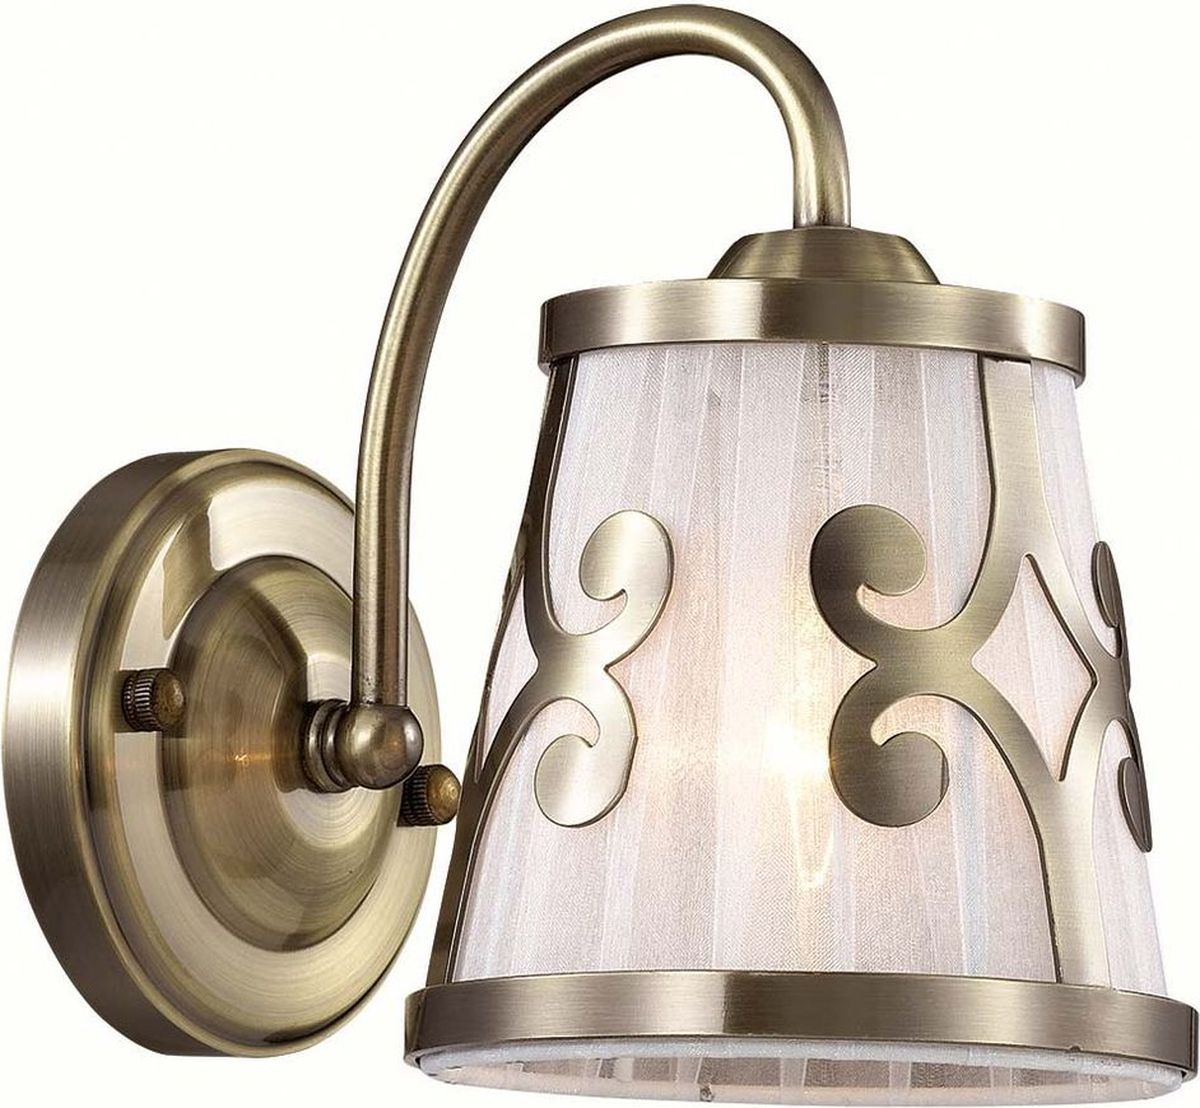 Бра Lumion Fetida Bronze, цвет: белый, E14, 60 Вт. 3285/1W3285/1W